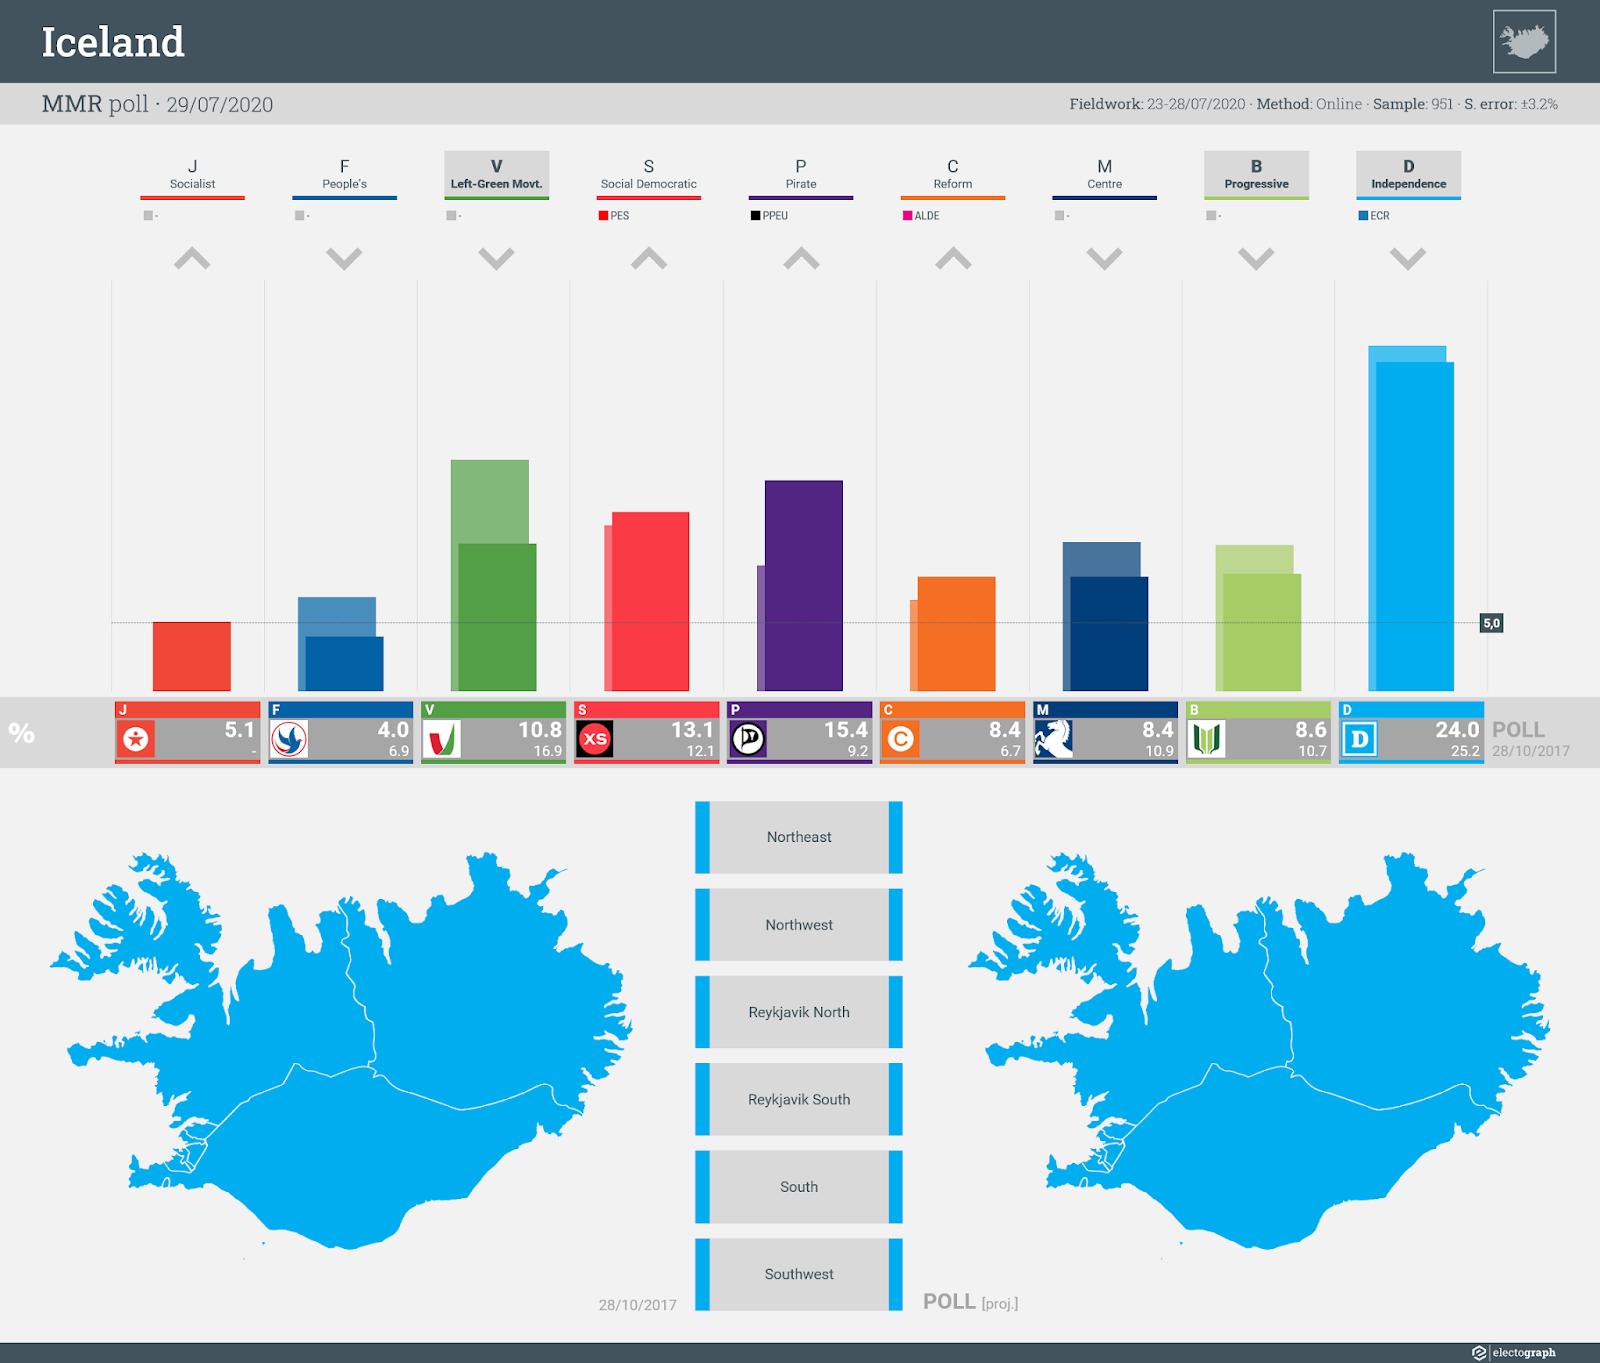 ICELAND: MMR poll chart, 29 July 2020